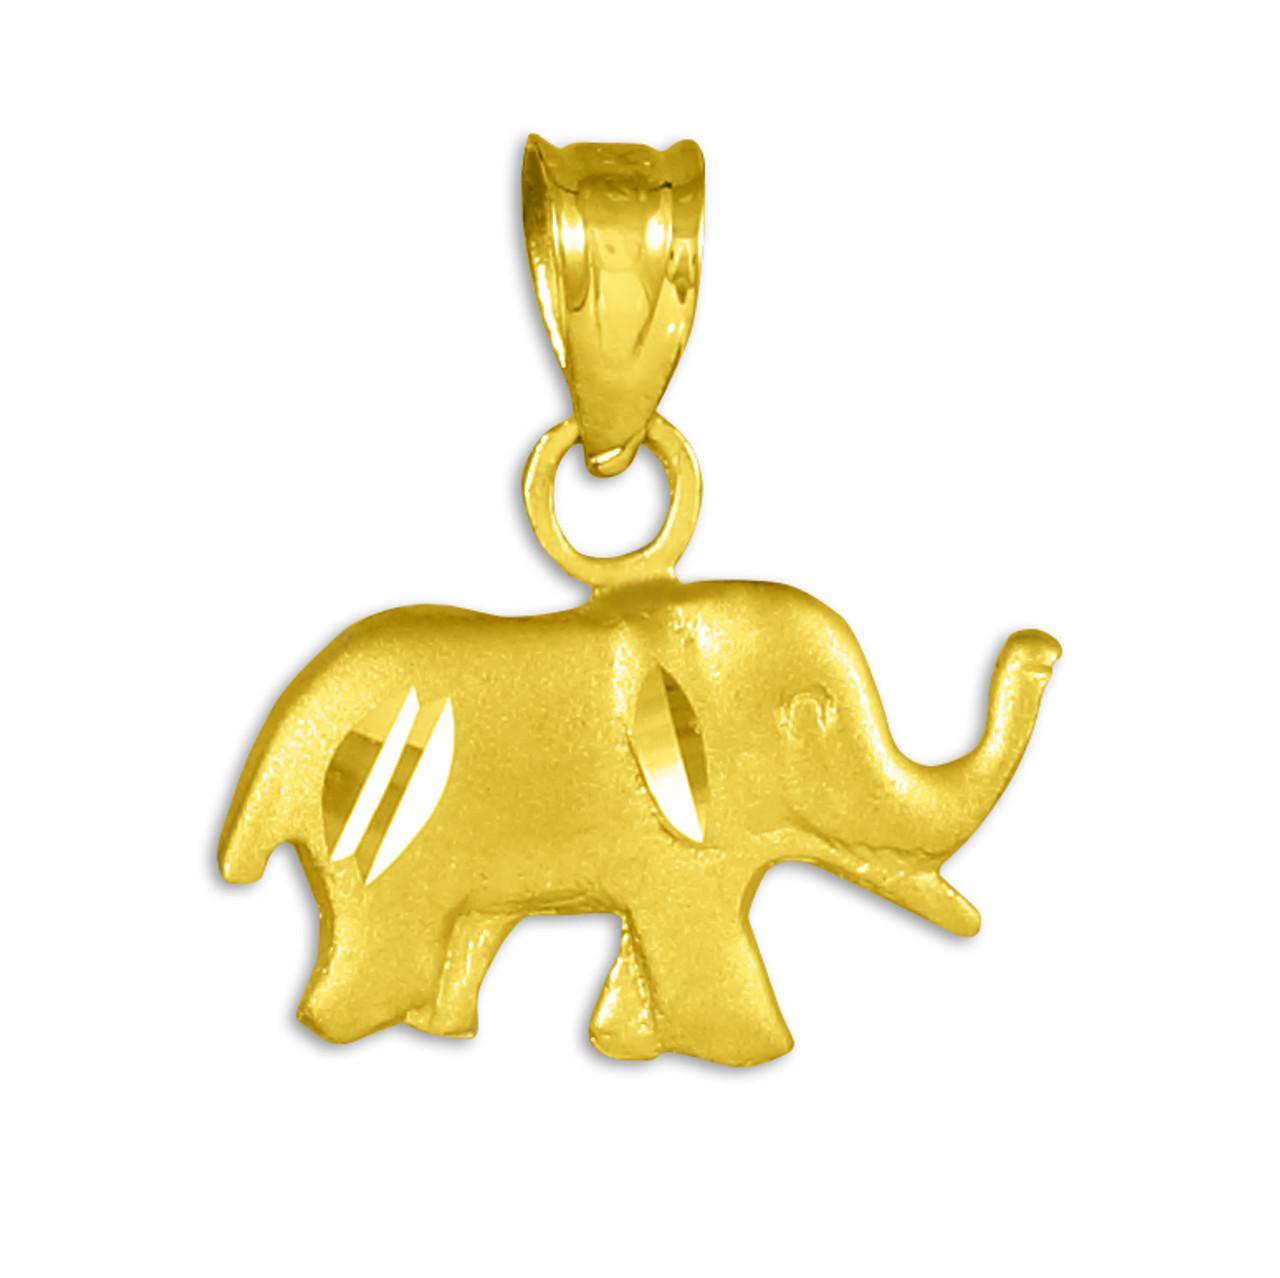 10k Yellow Gold Diamond Cut /& Satin UNICORN IN RING Charm